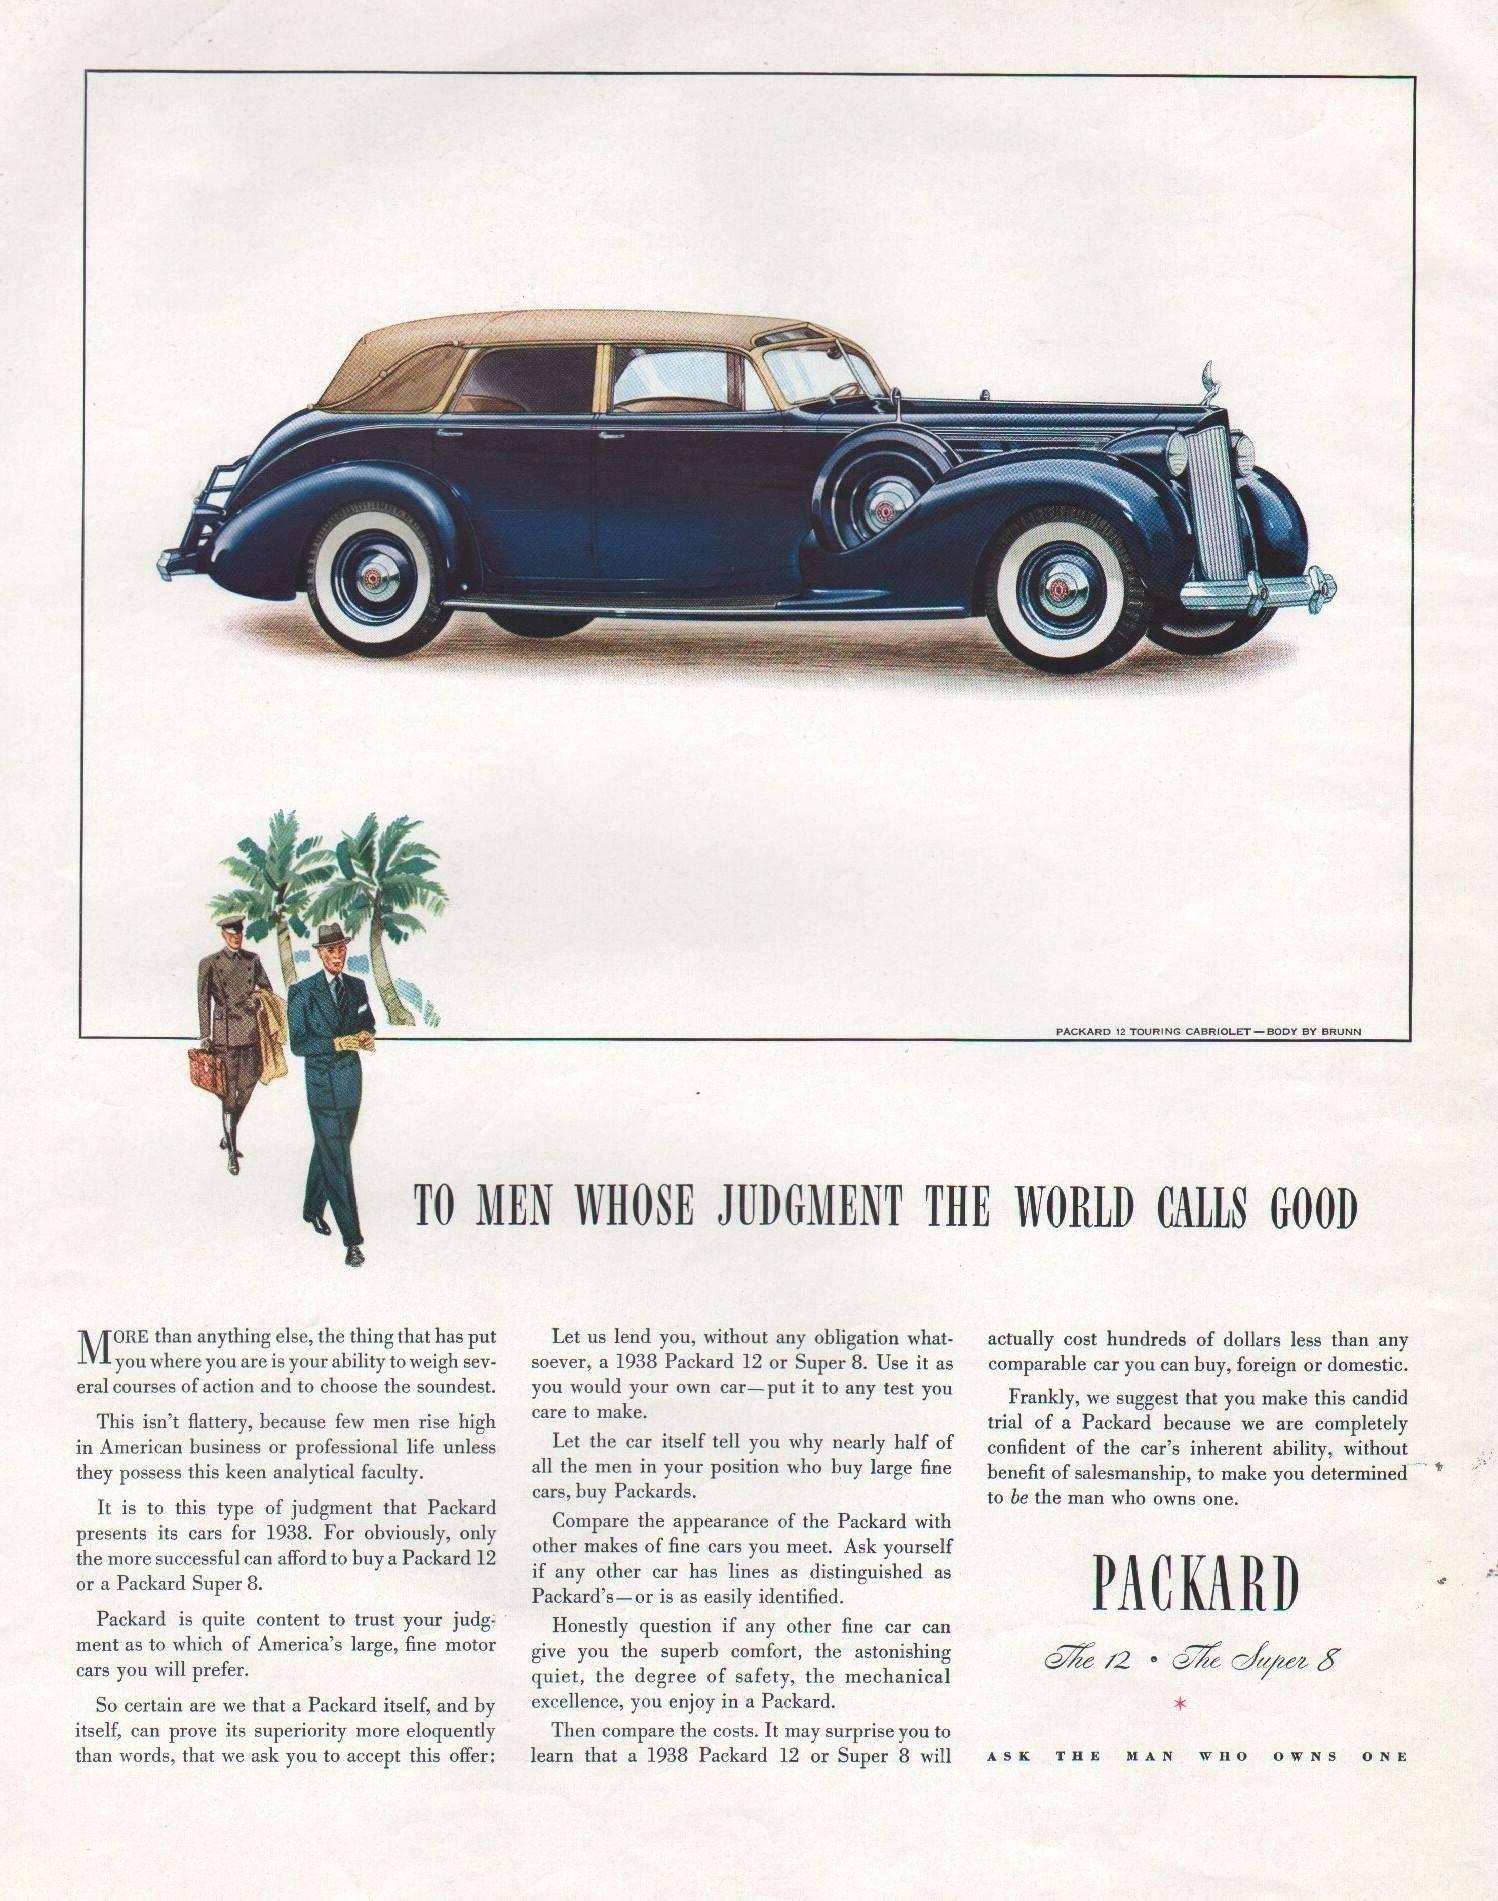 1938 Twelve Touring Cabriolet - Body by Brunn